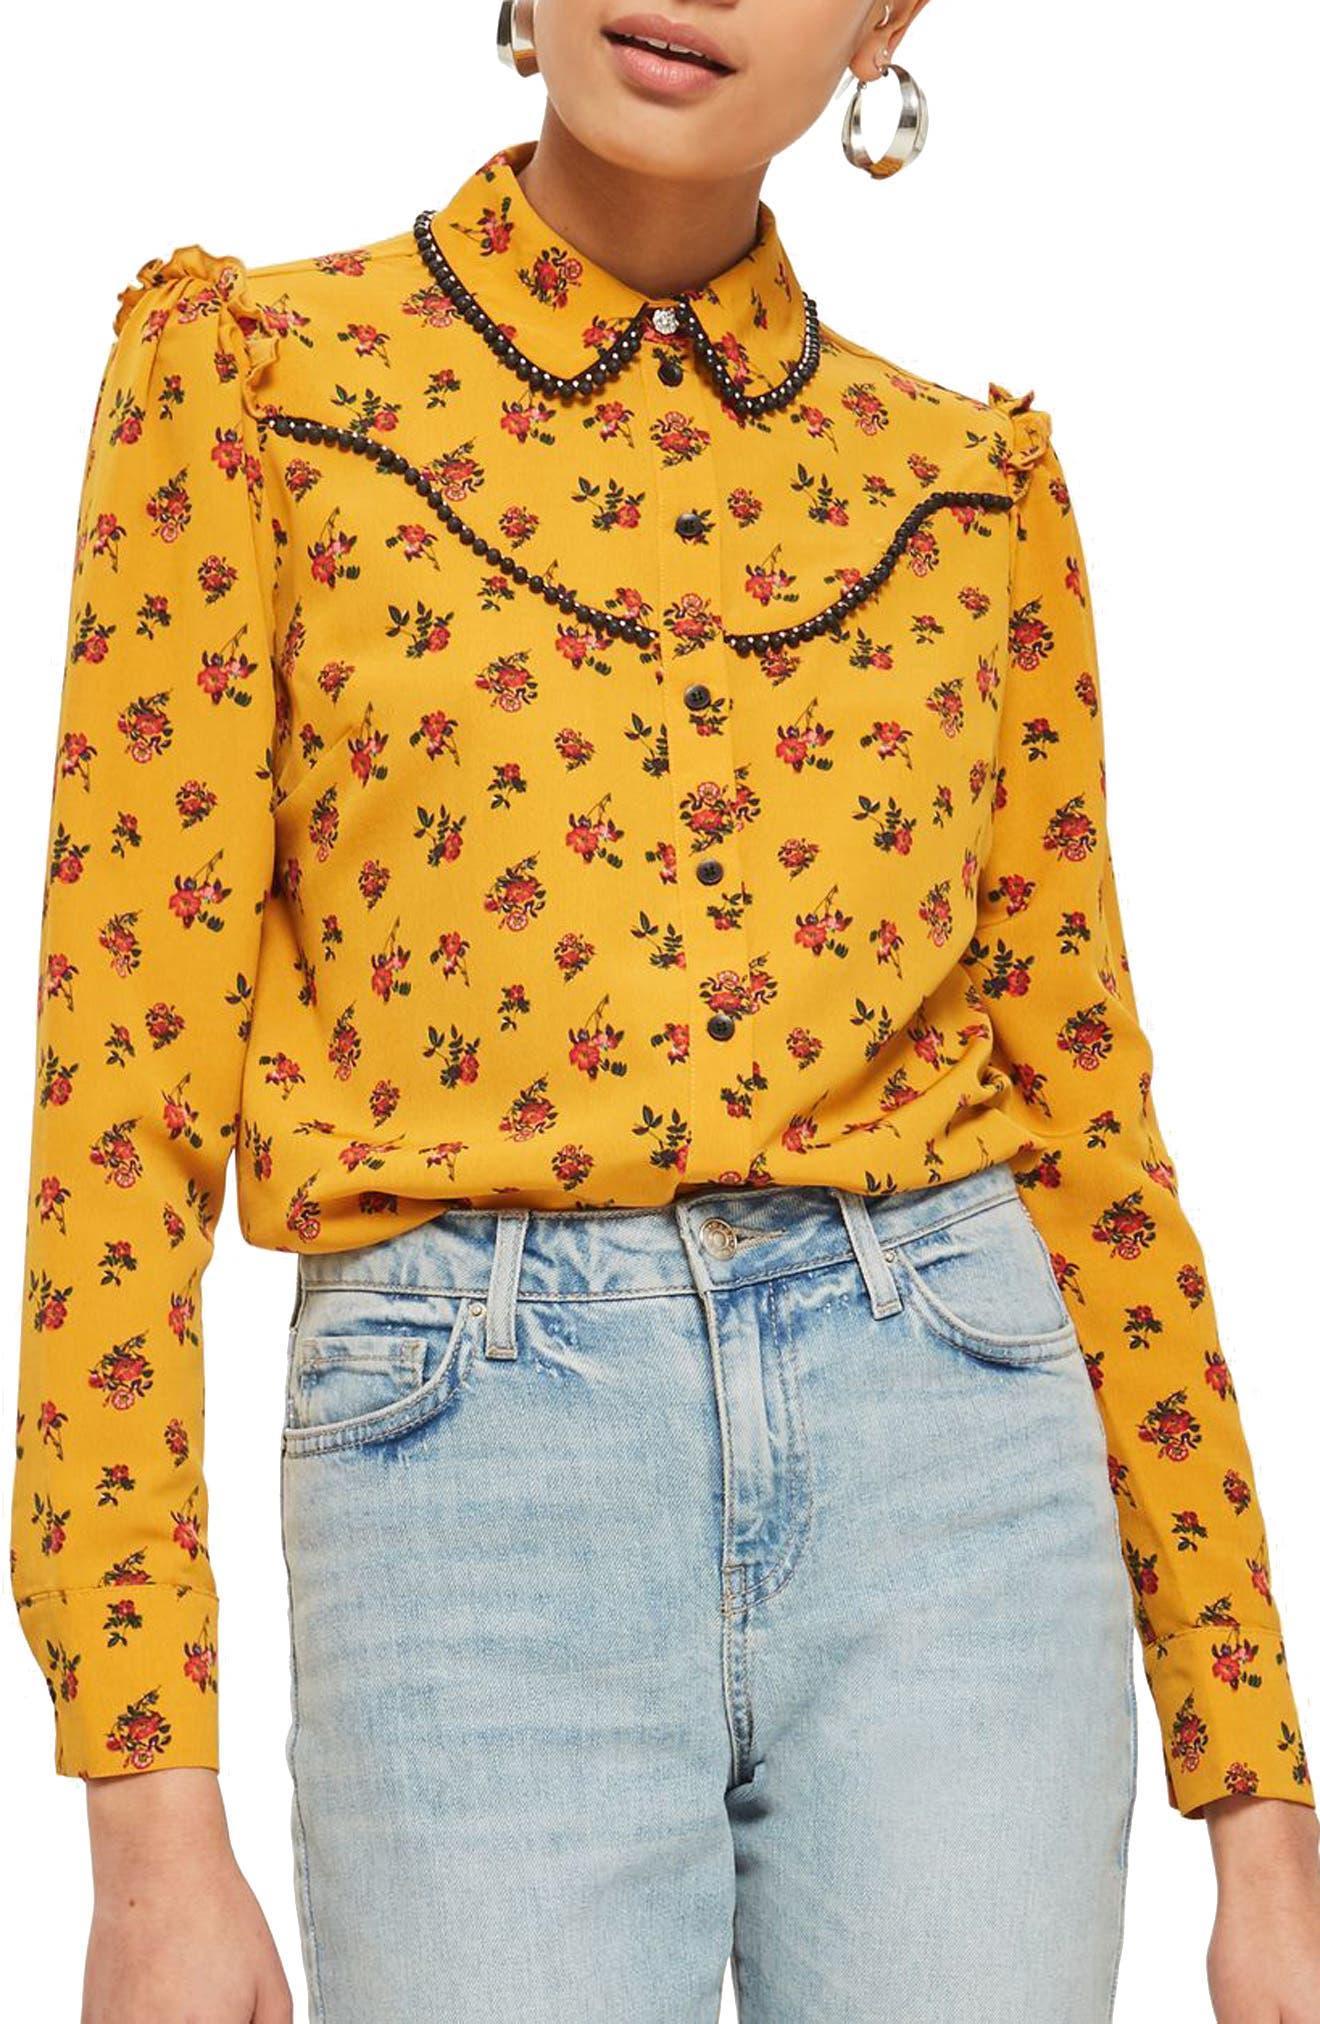 Rodeo Floral Retro Shirt,                         Main,                         color, Mustard